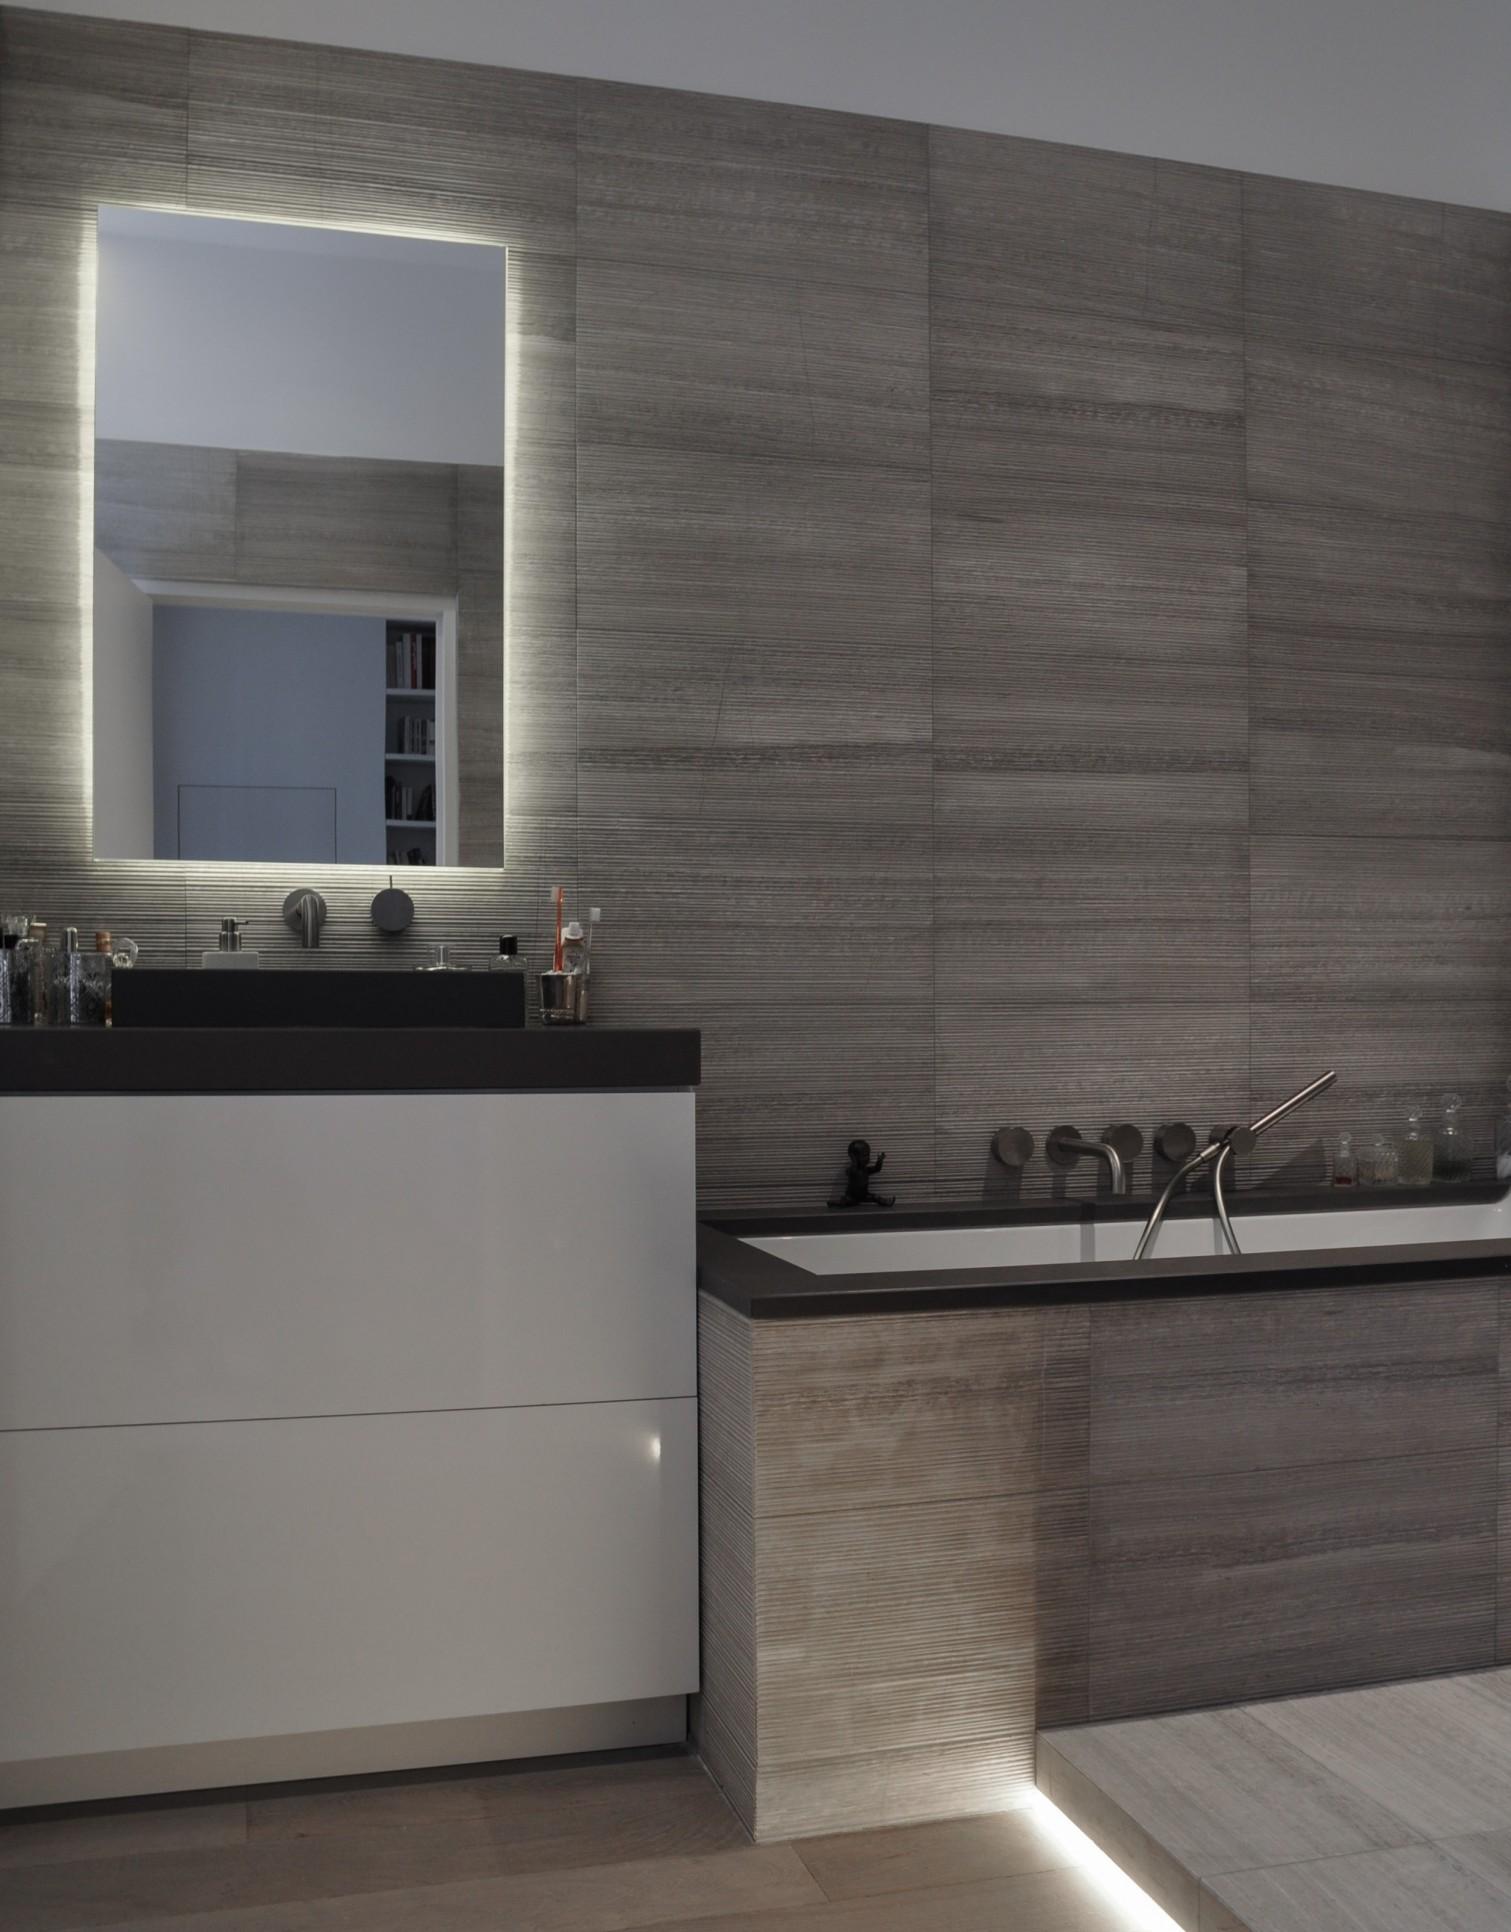 Habitations / Salle de bain